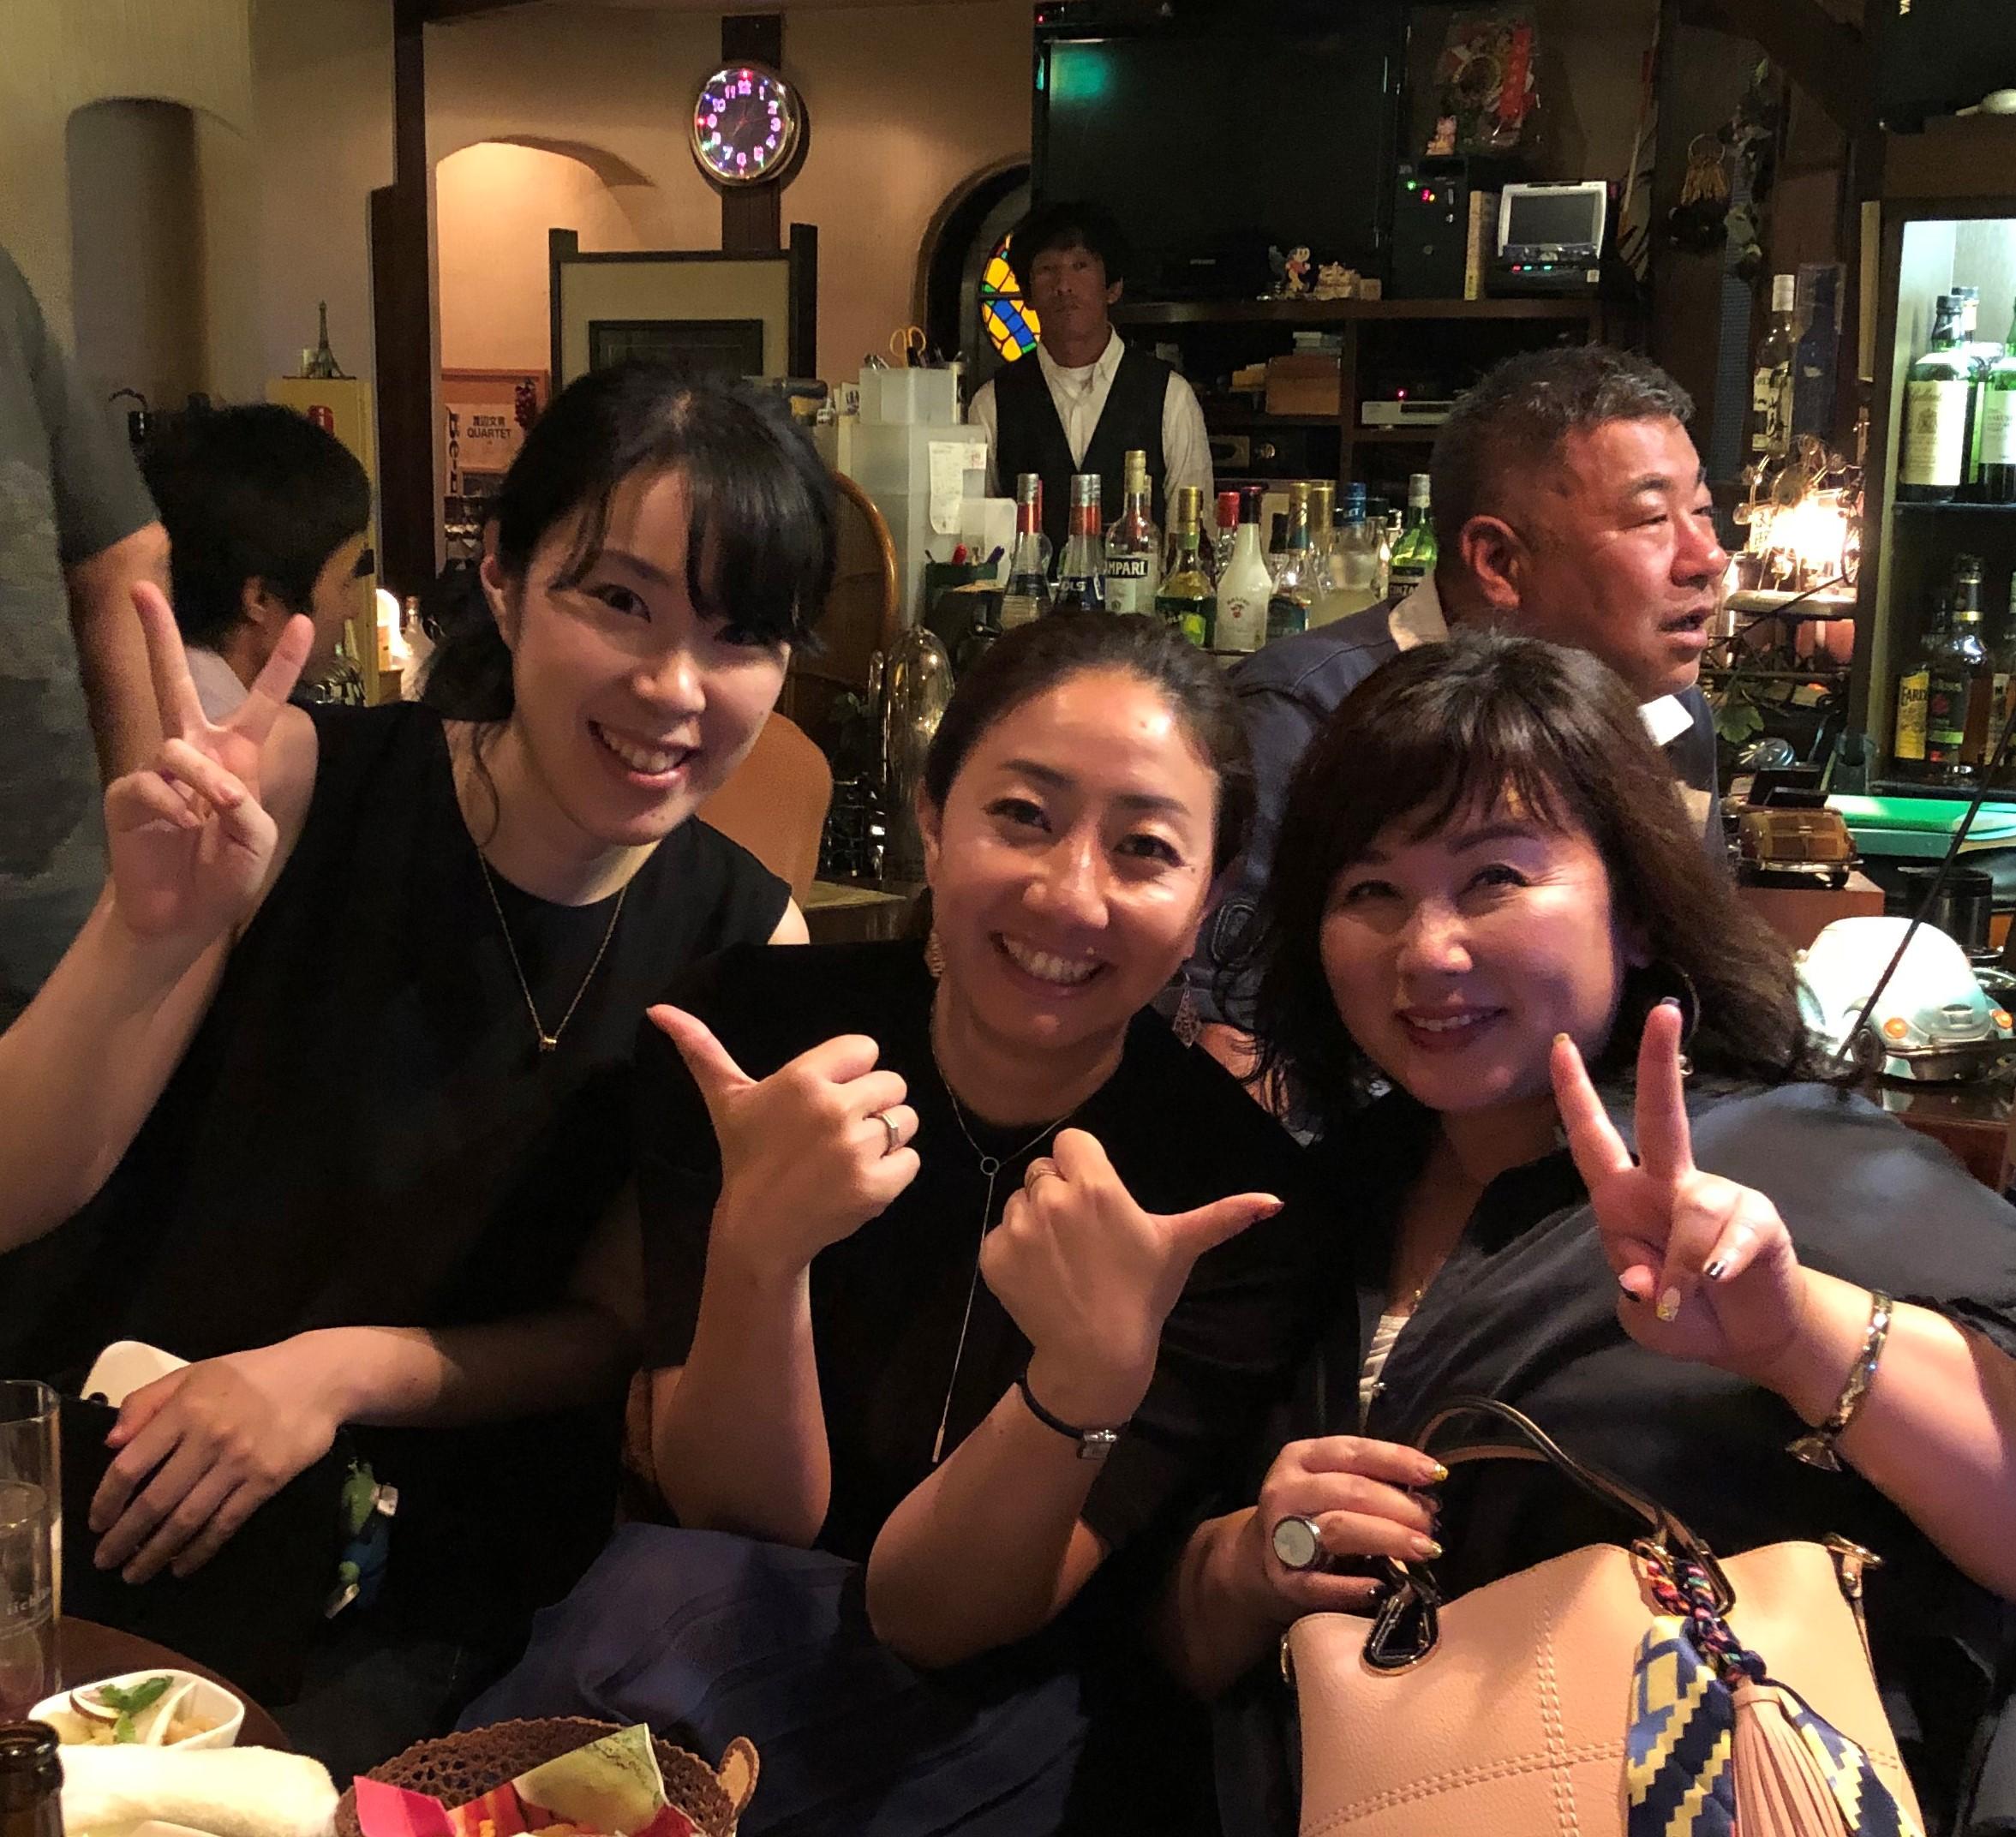 2018-09-02_00-13-04_IMG_5385.JPG